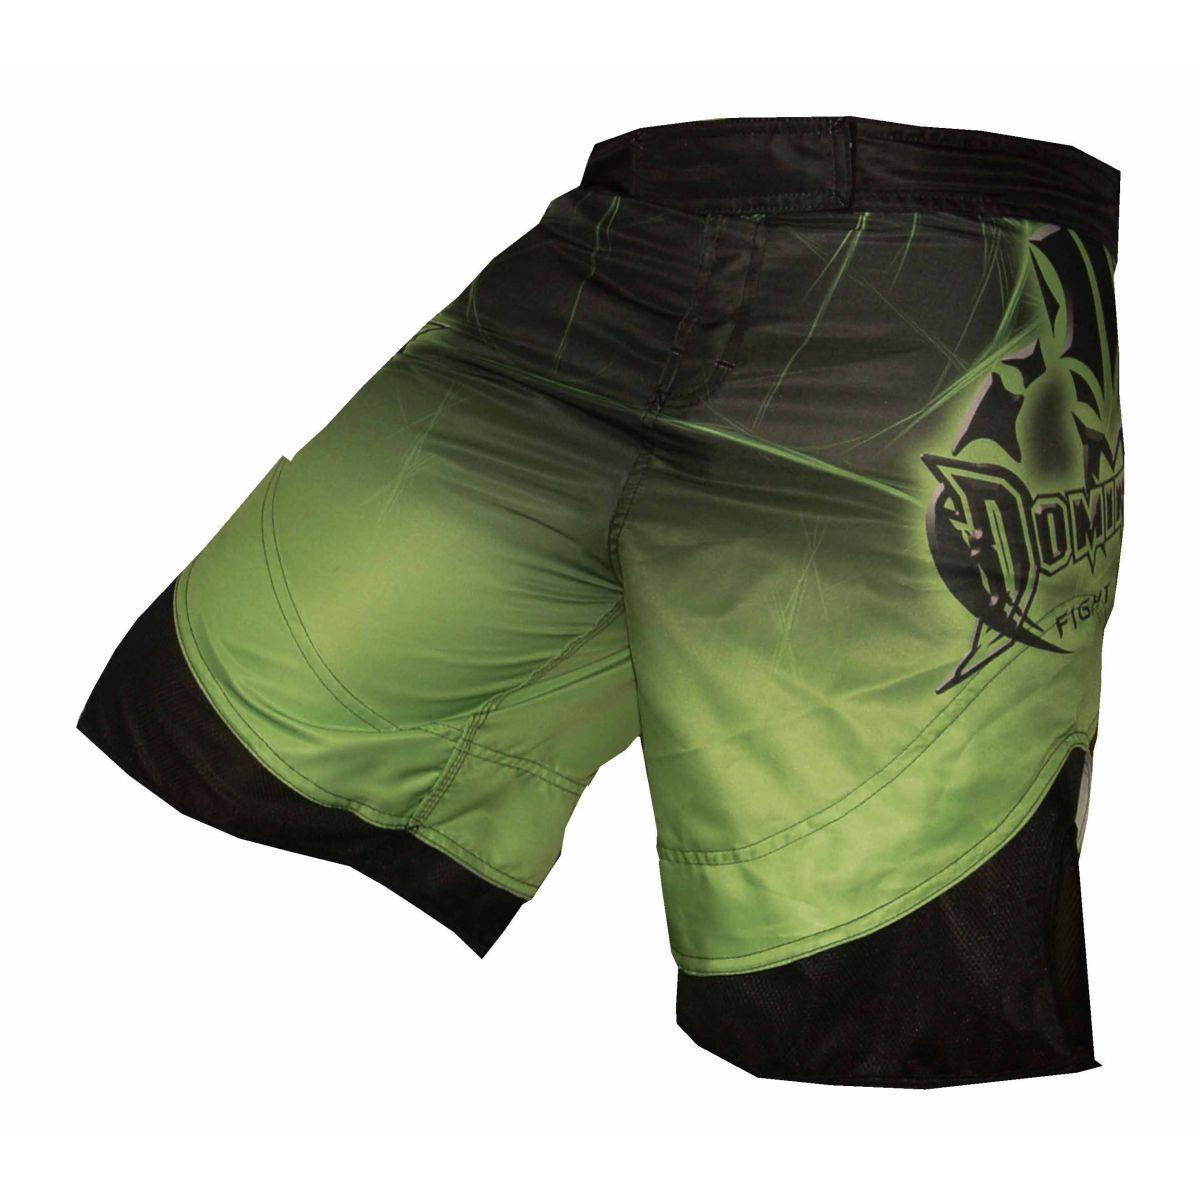 Bermuda MMA - Fightshort 2778VE - Preto/Verde -  Dominium .